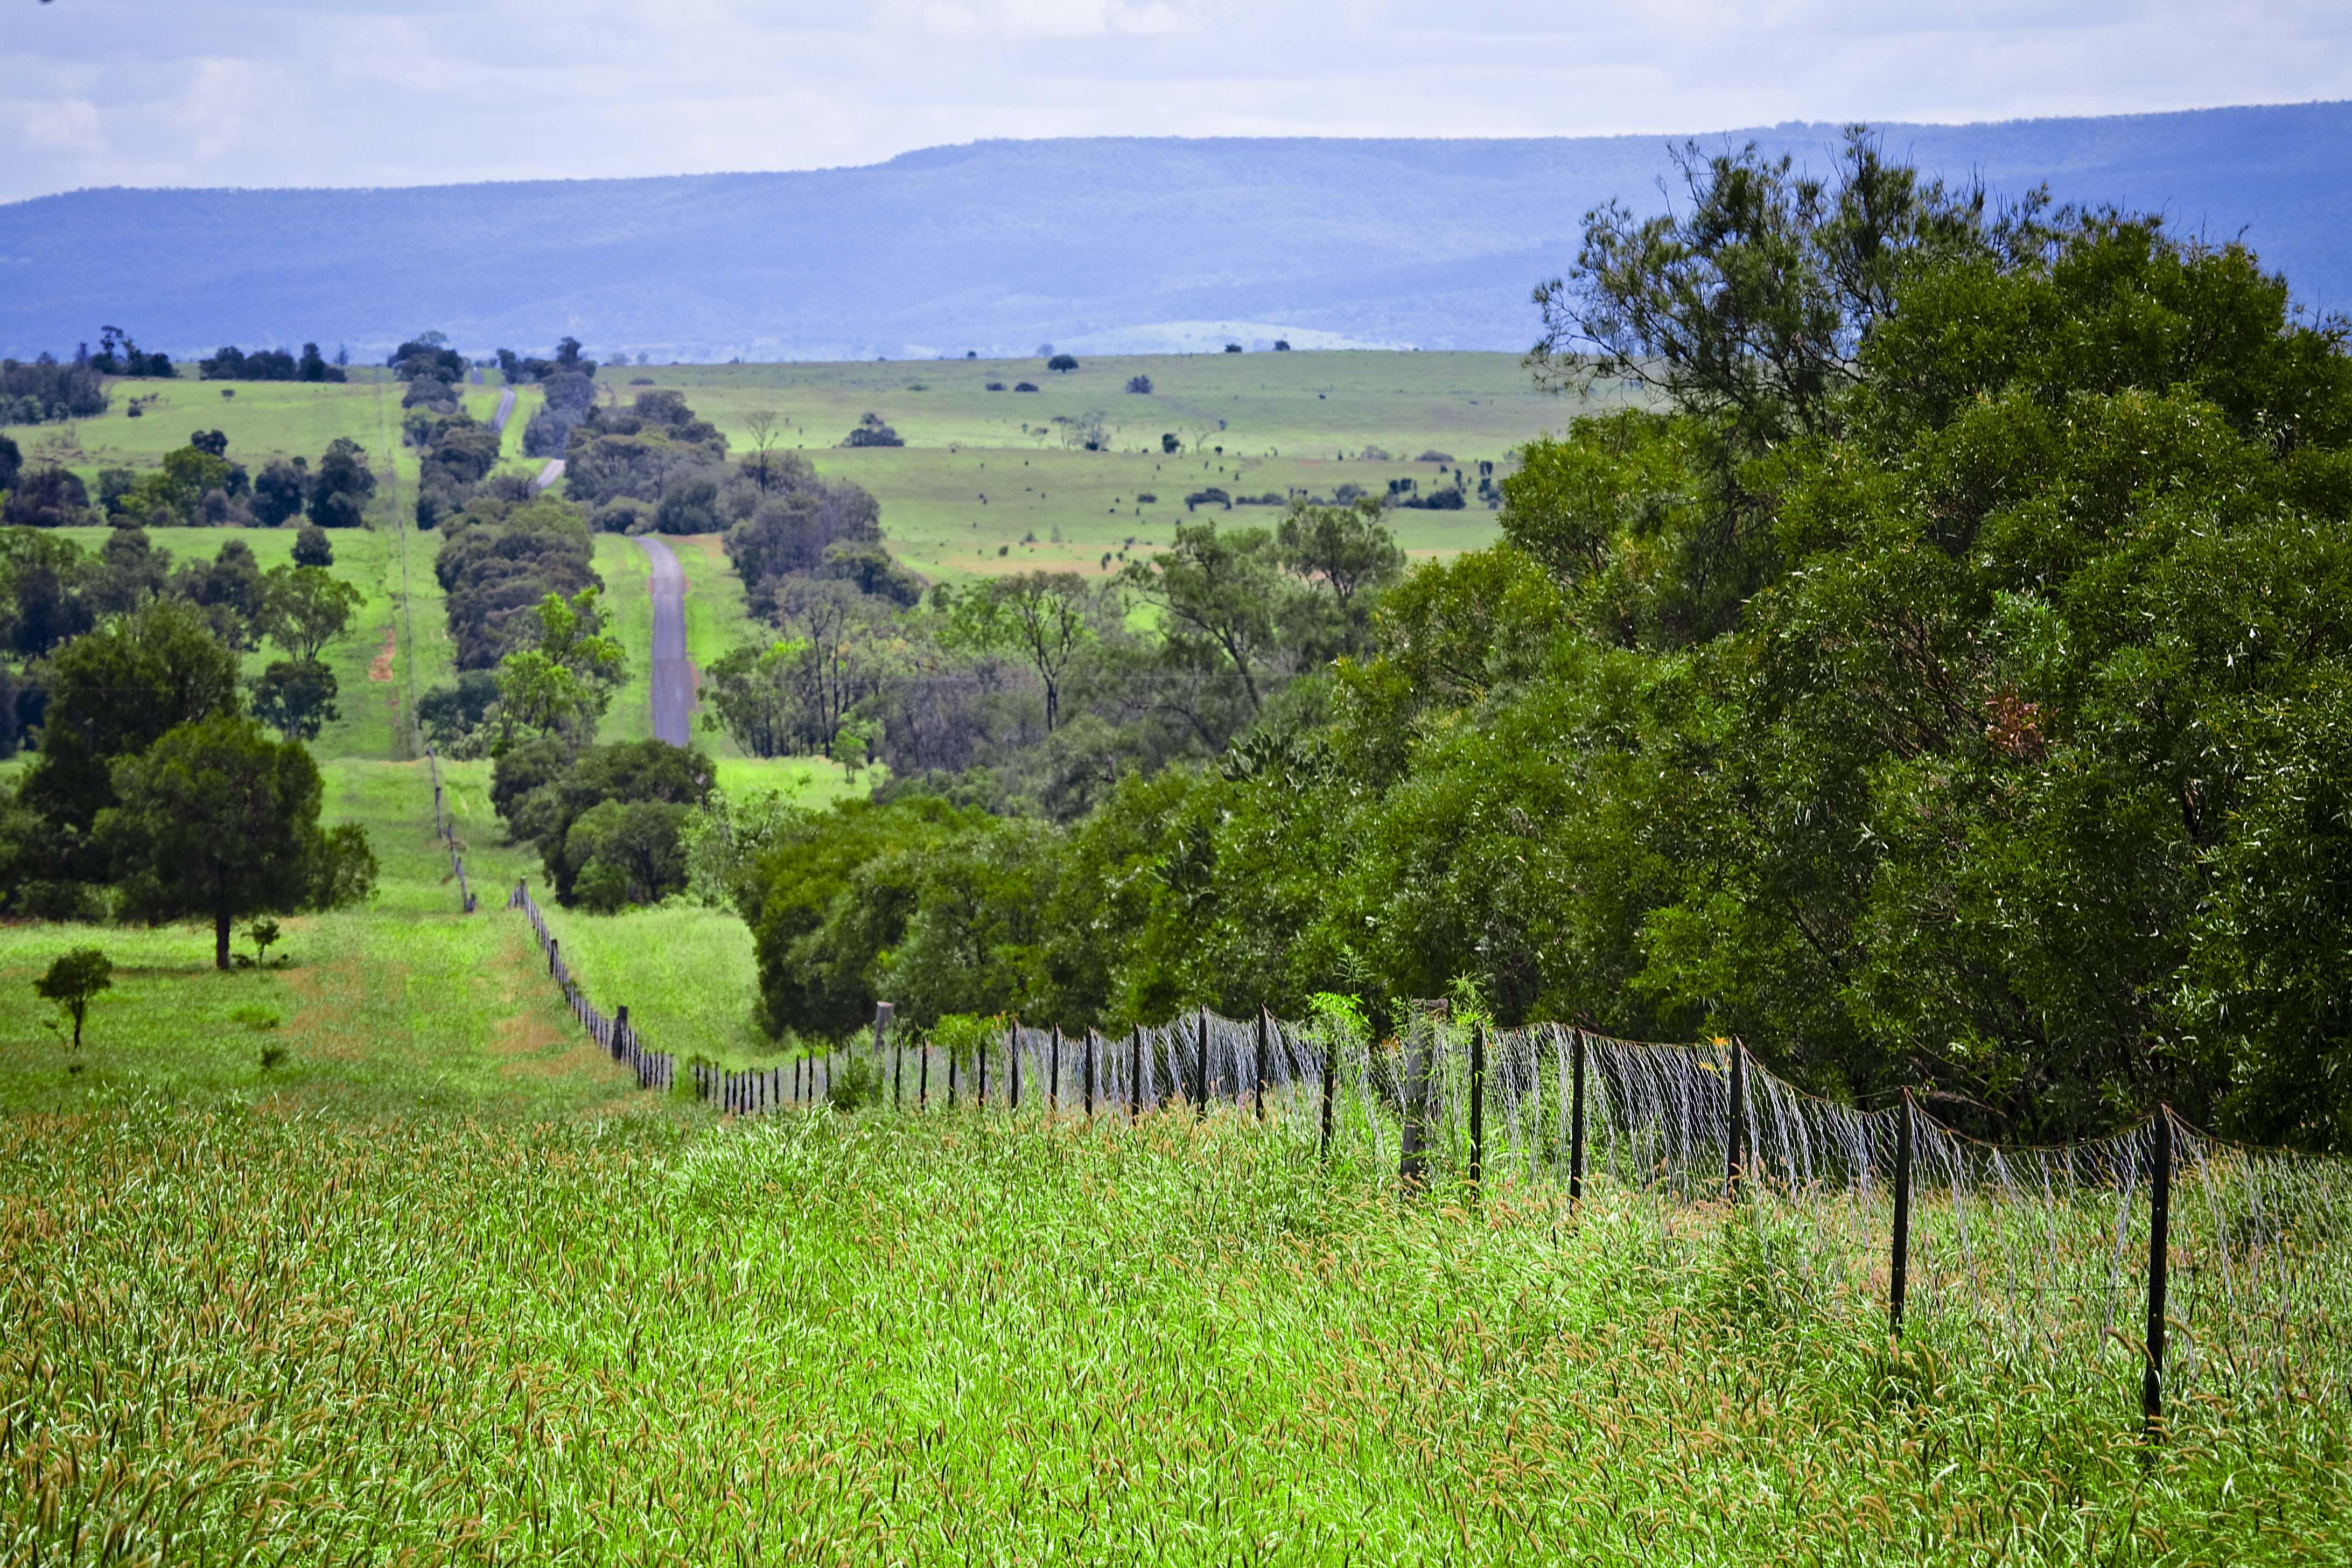 Injune, Dingo Barrier Fence, Womblebank Gap Rd, Ro